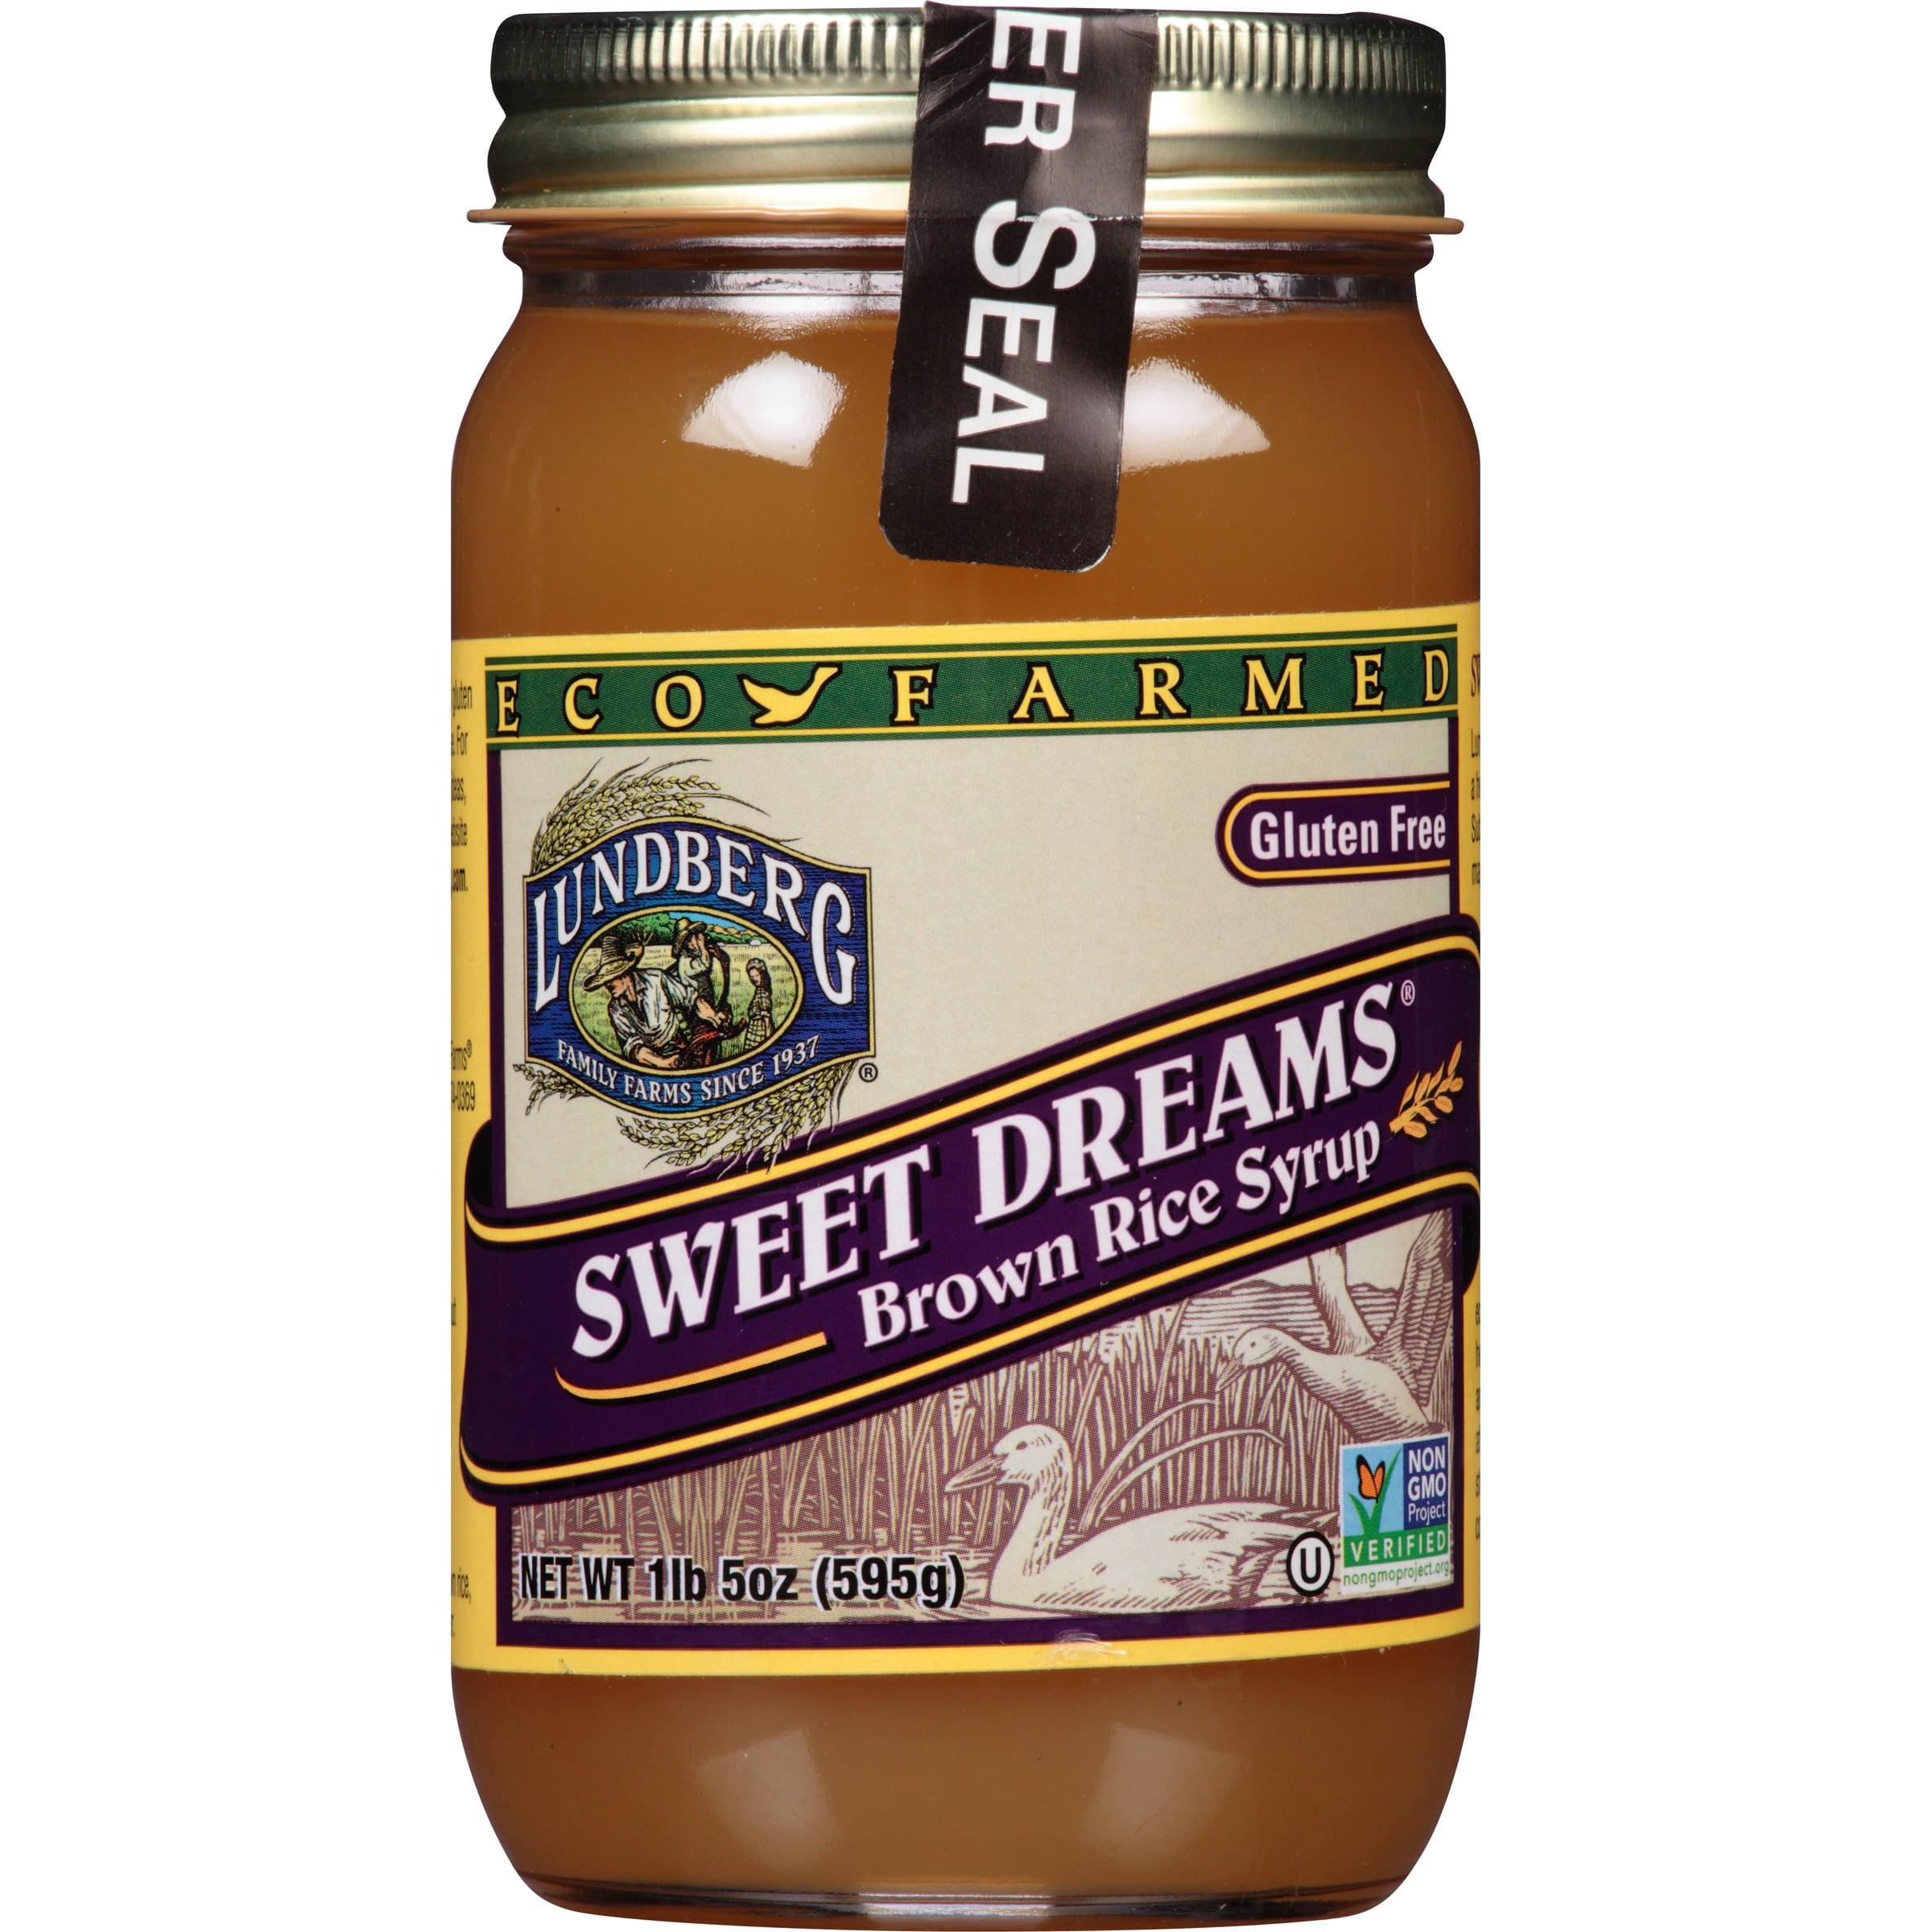 Lundberg Organic Sweet Dreams Brown Rice Syrup, 21 Oz